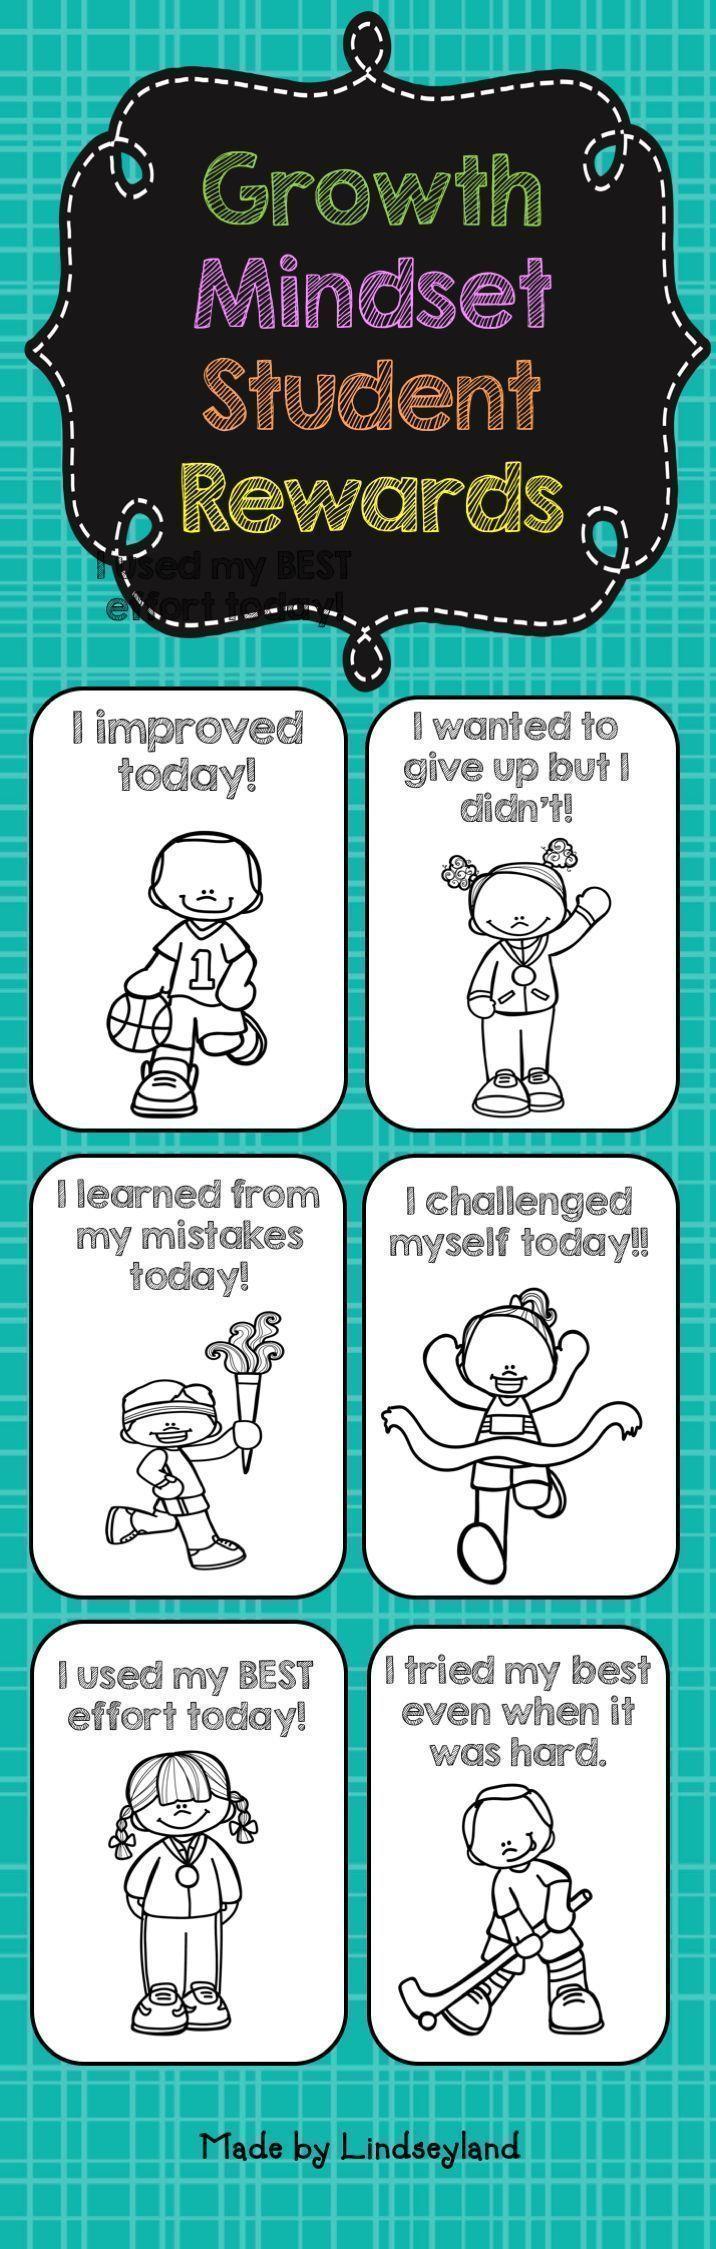 8 best adnan images on Pinterest | Grammar worksheets, Teaching ...